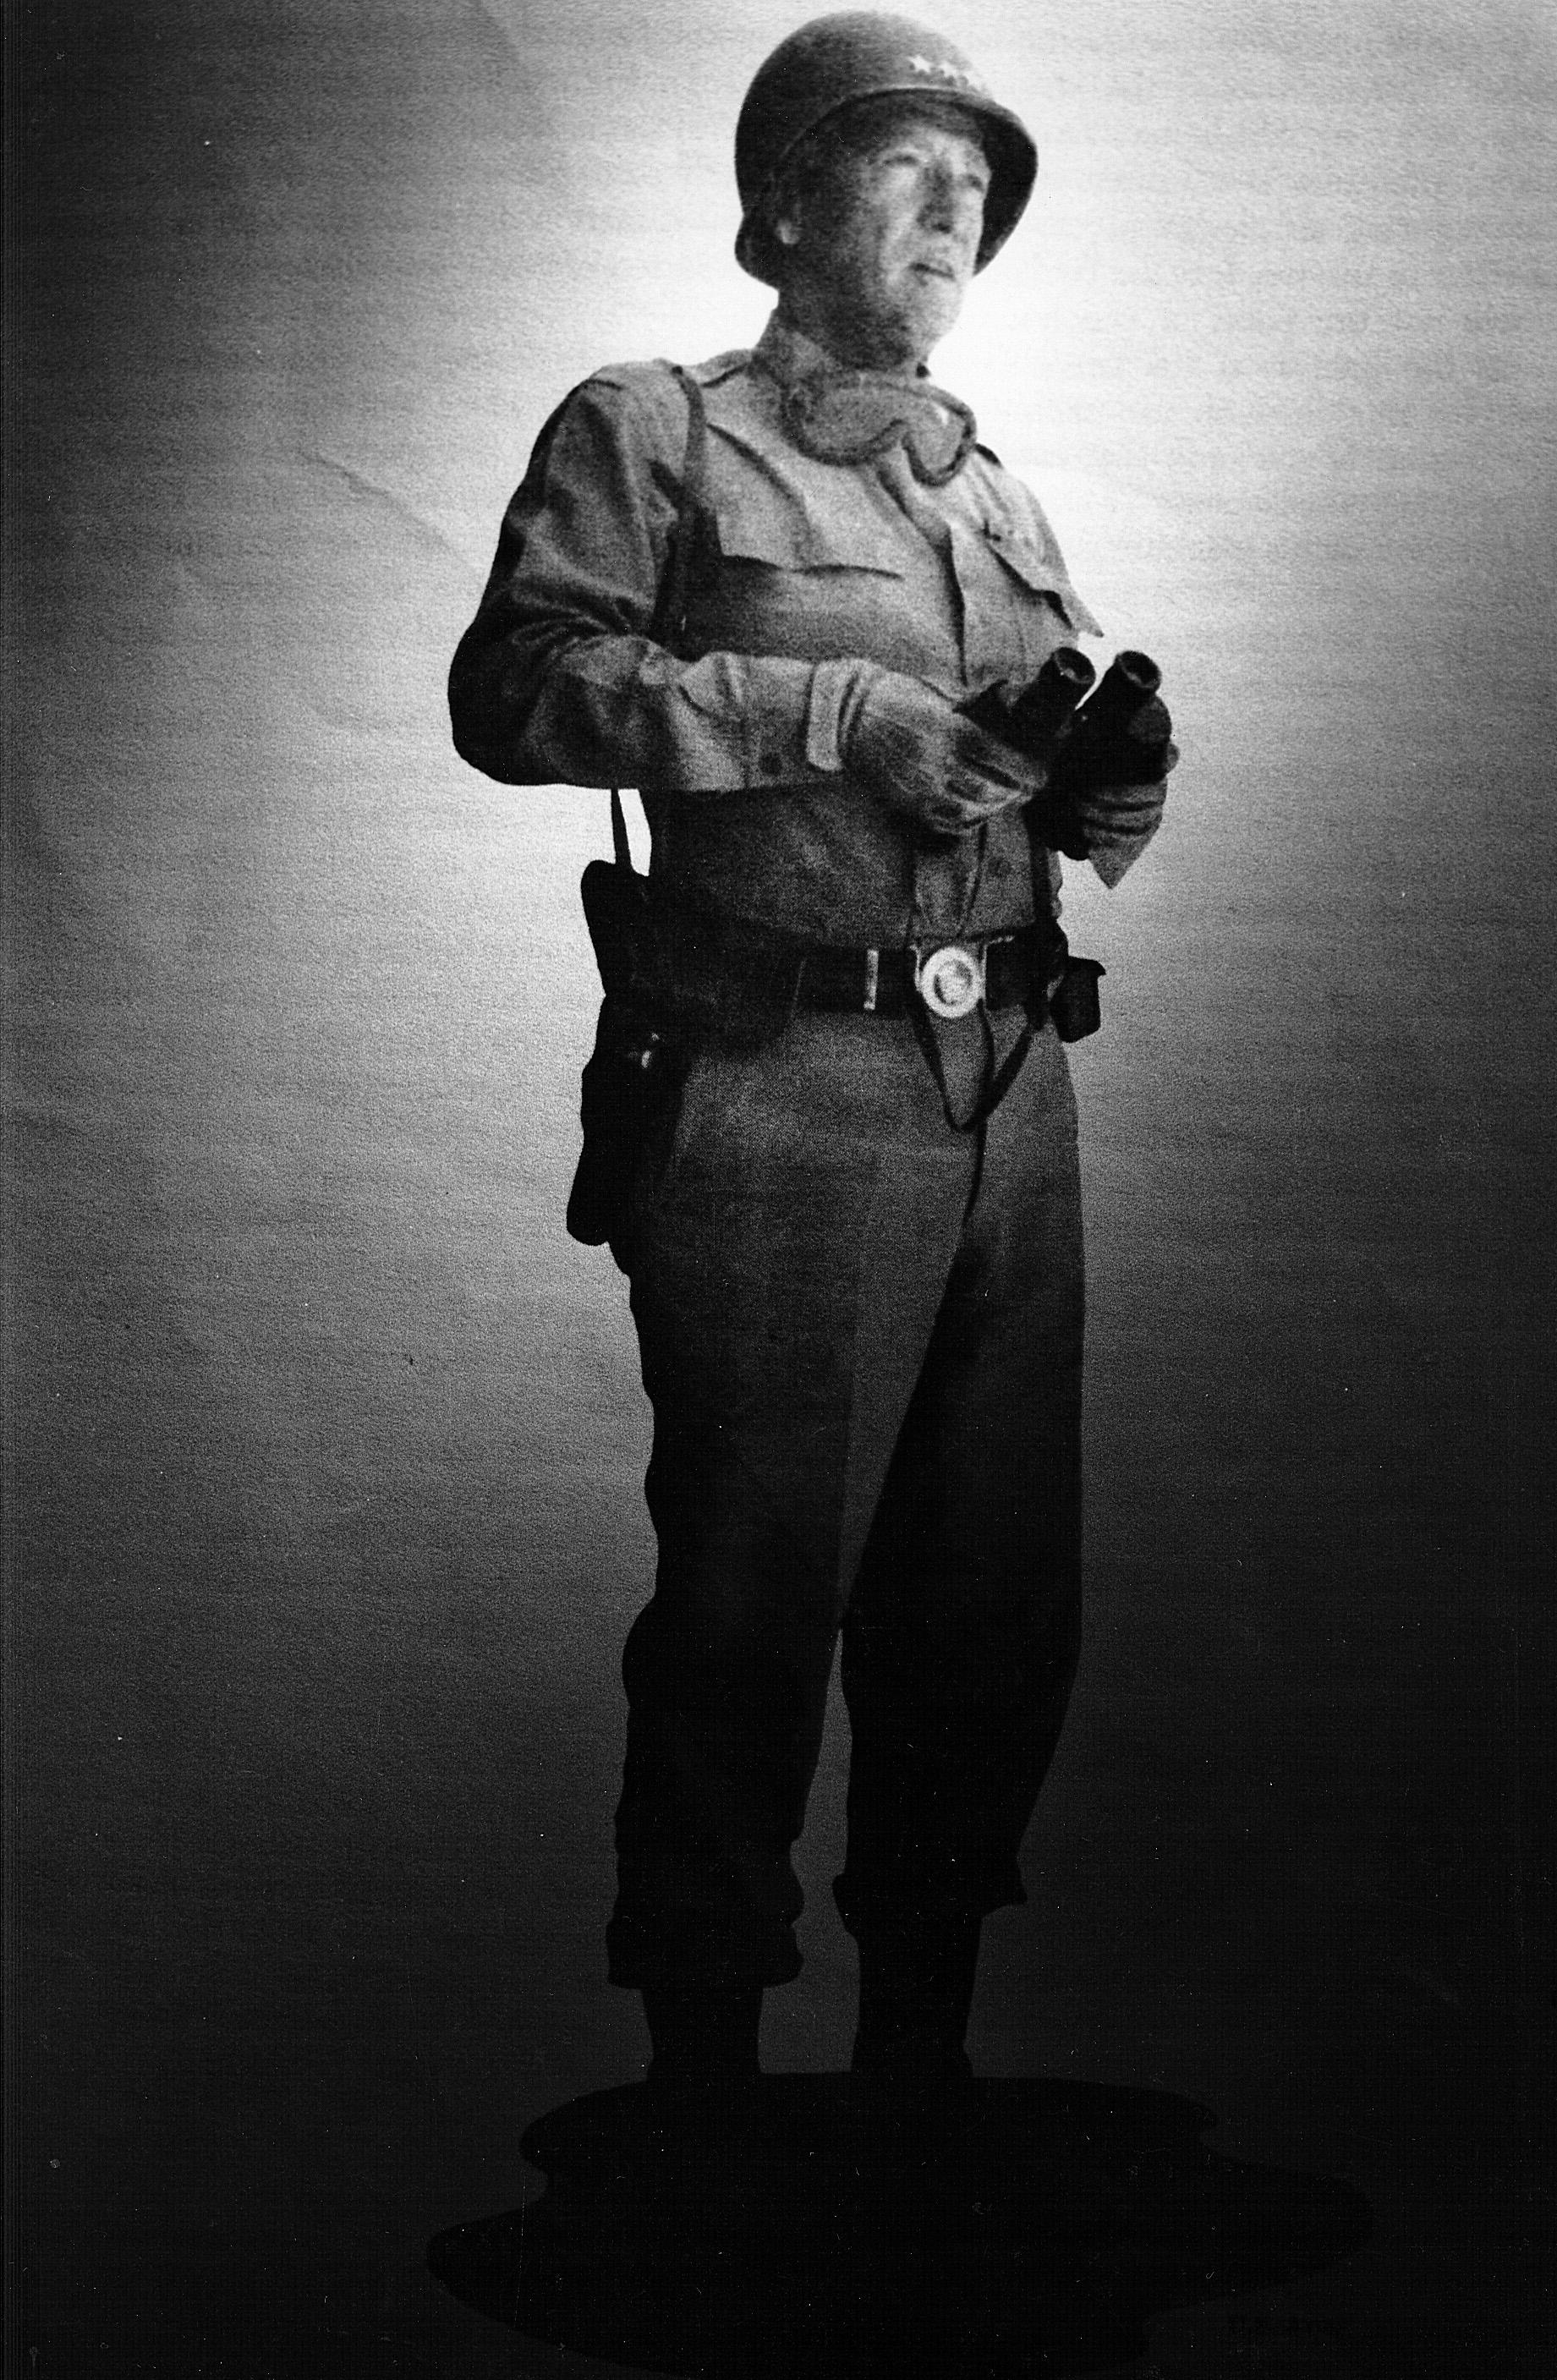 LTG George S. Patton. Credit: General George S. Patton Jr. Collection.